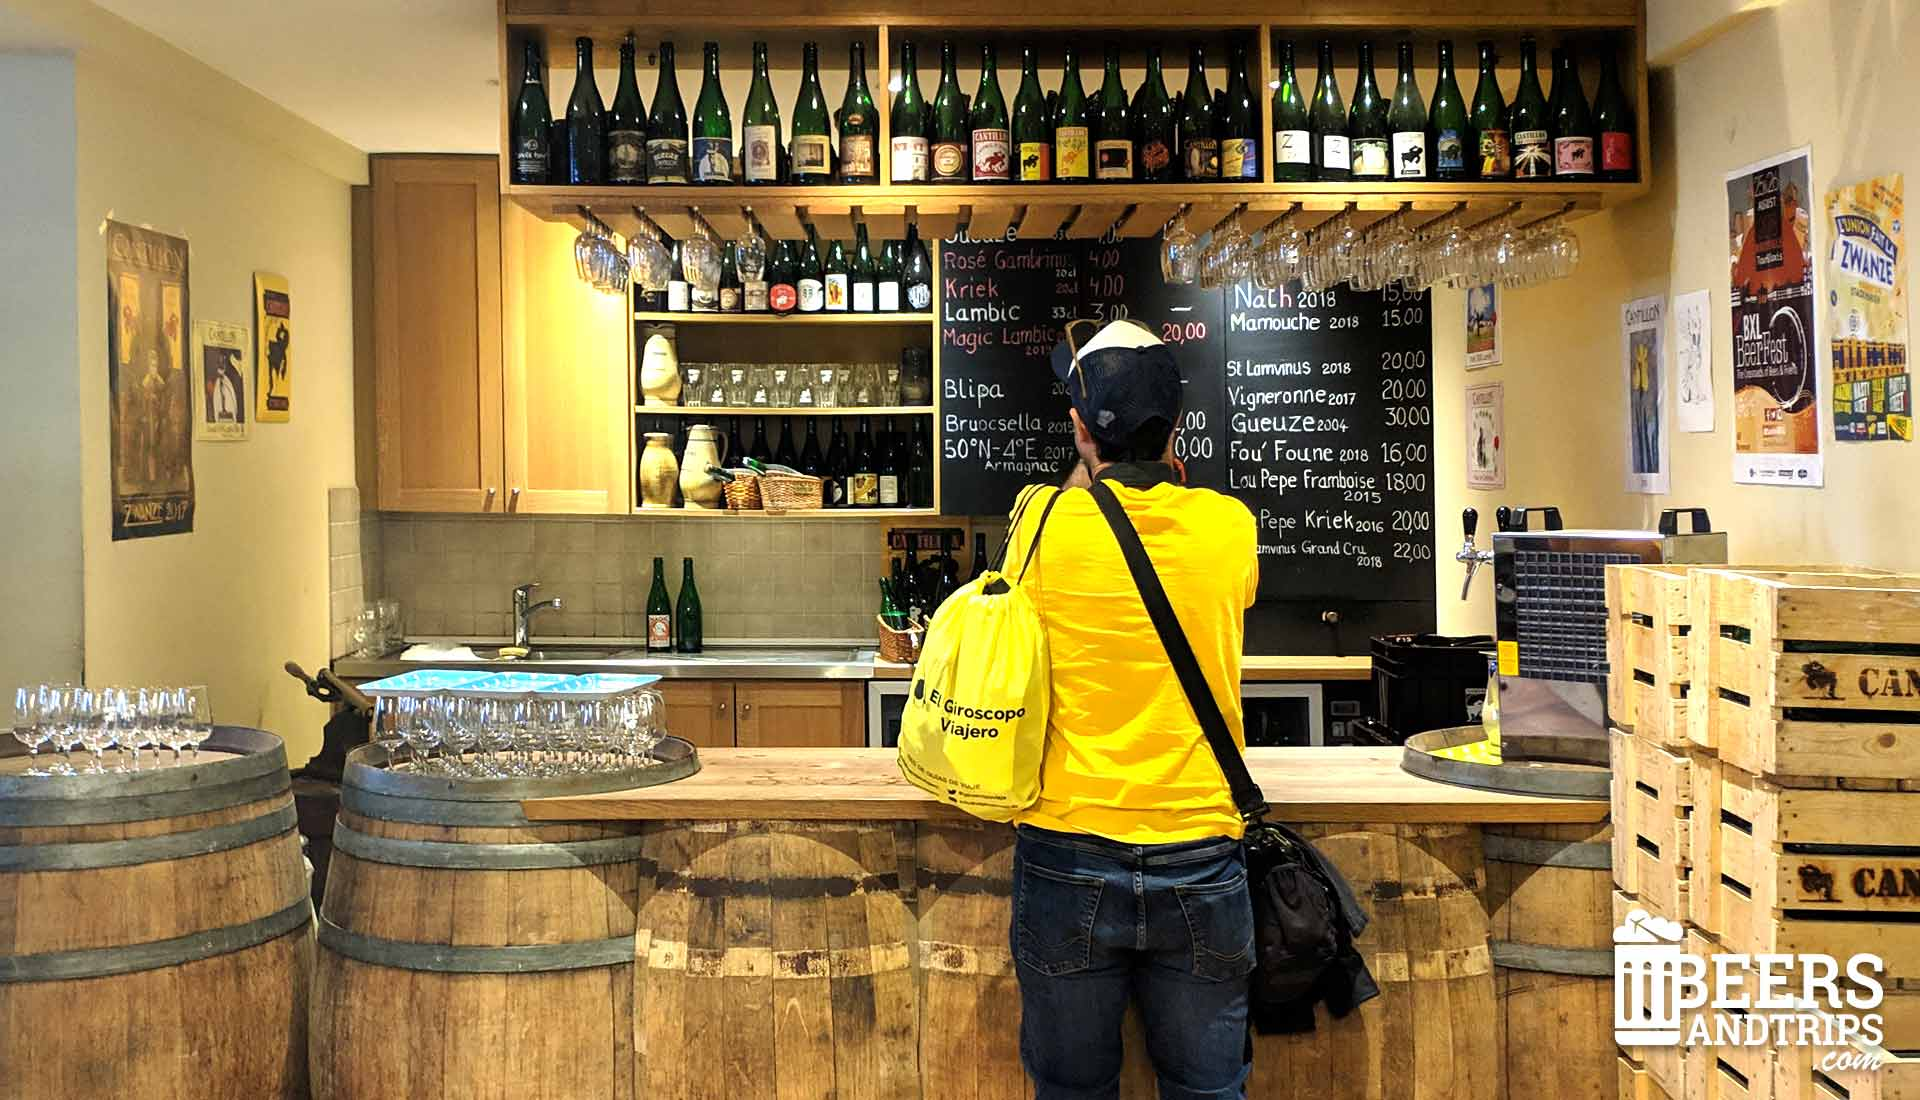 El bar de la fábrica Cantillon